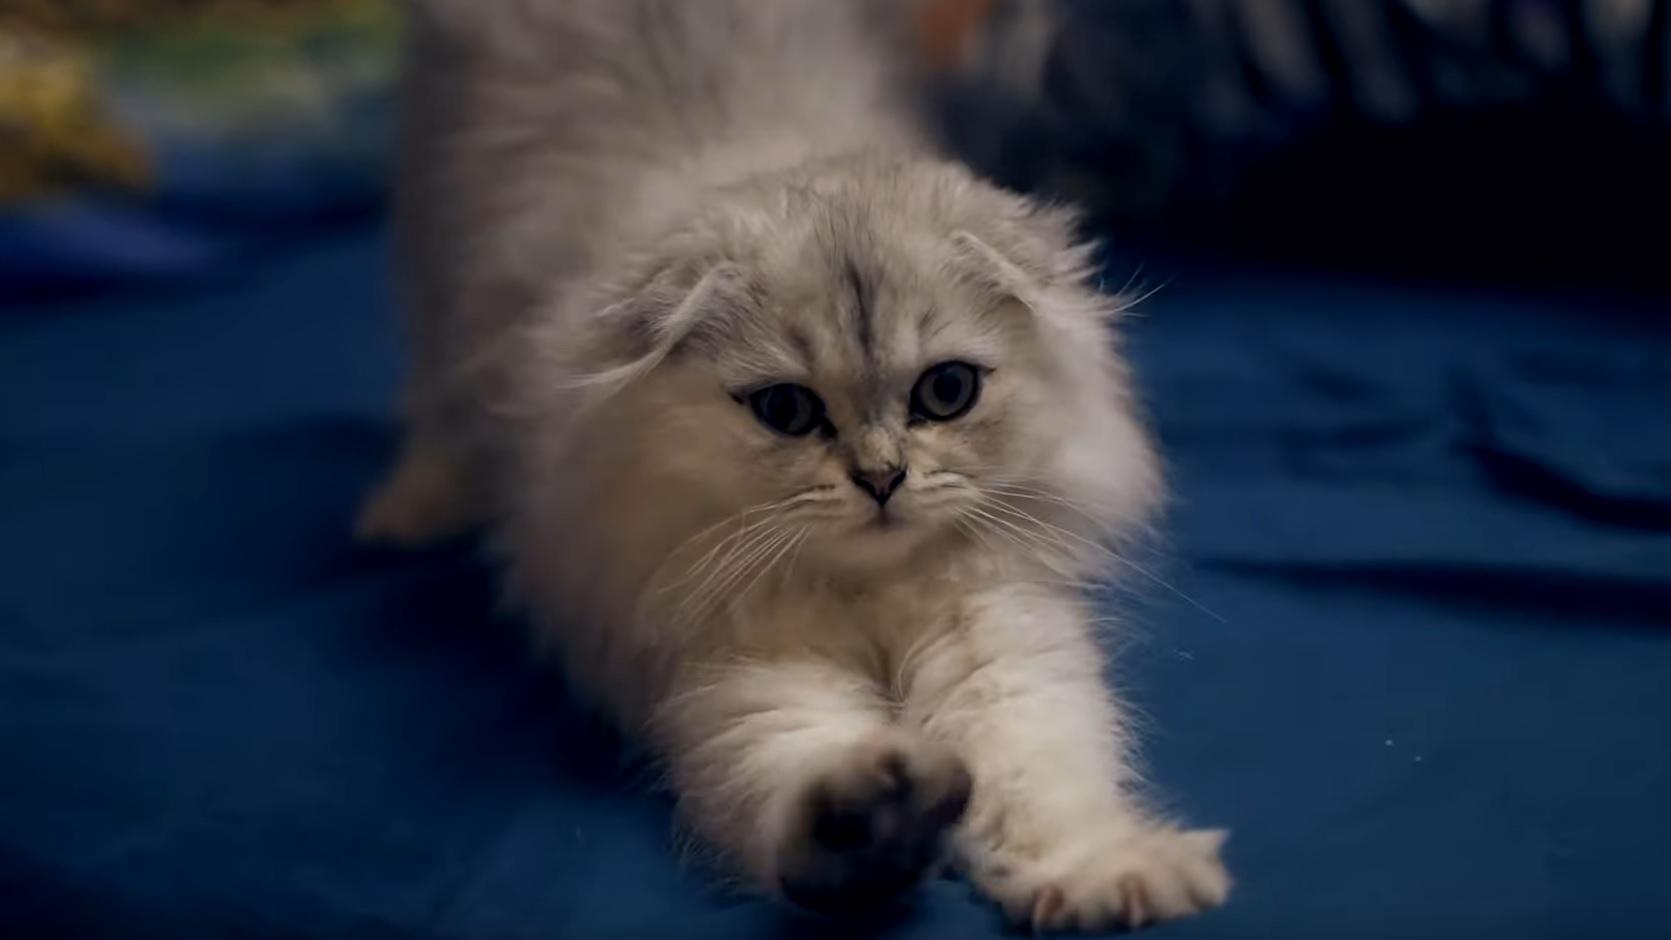 Adorable Kitten Video